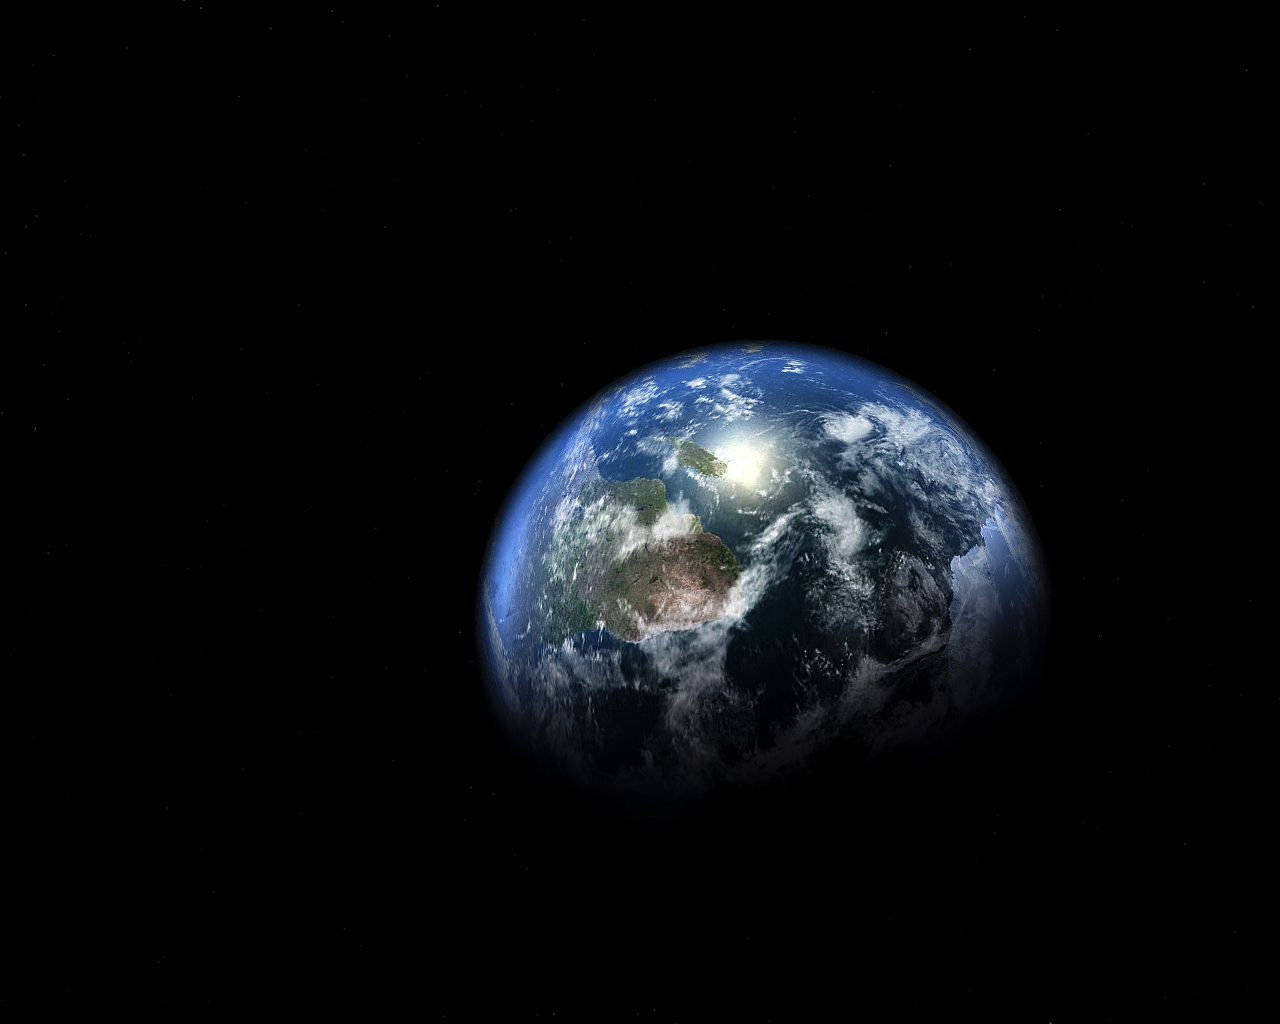 Planeta Tierra Hd Wallpaper El Universo Pinterest Tierra